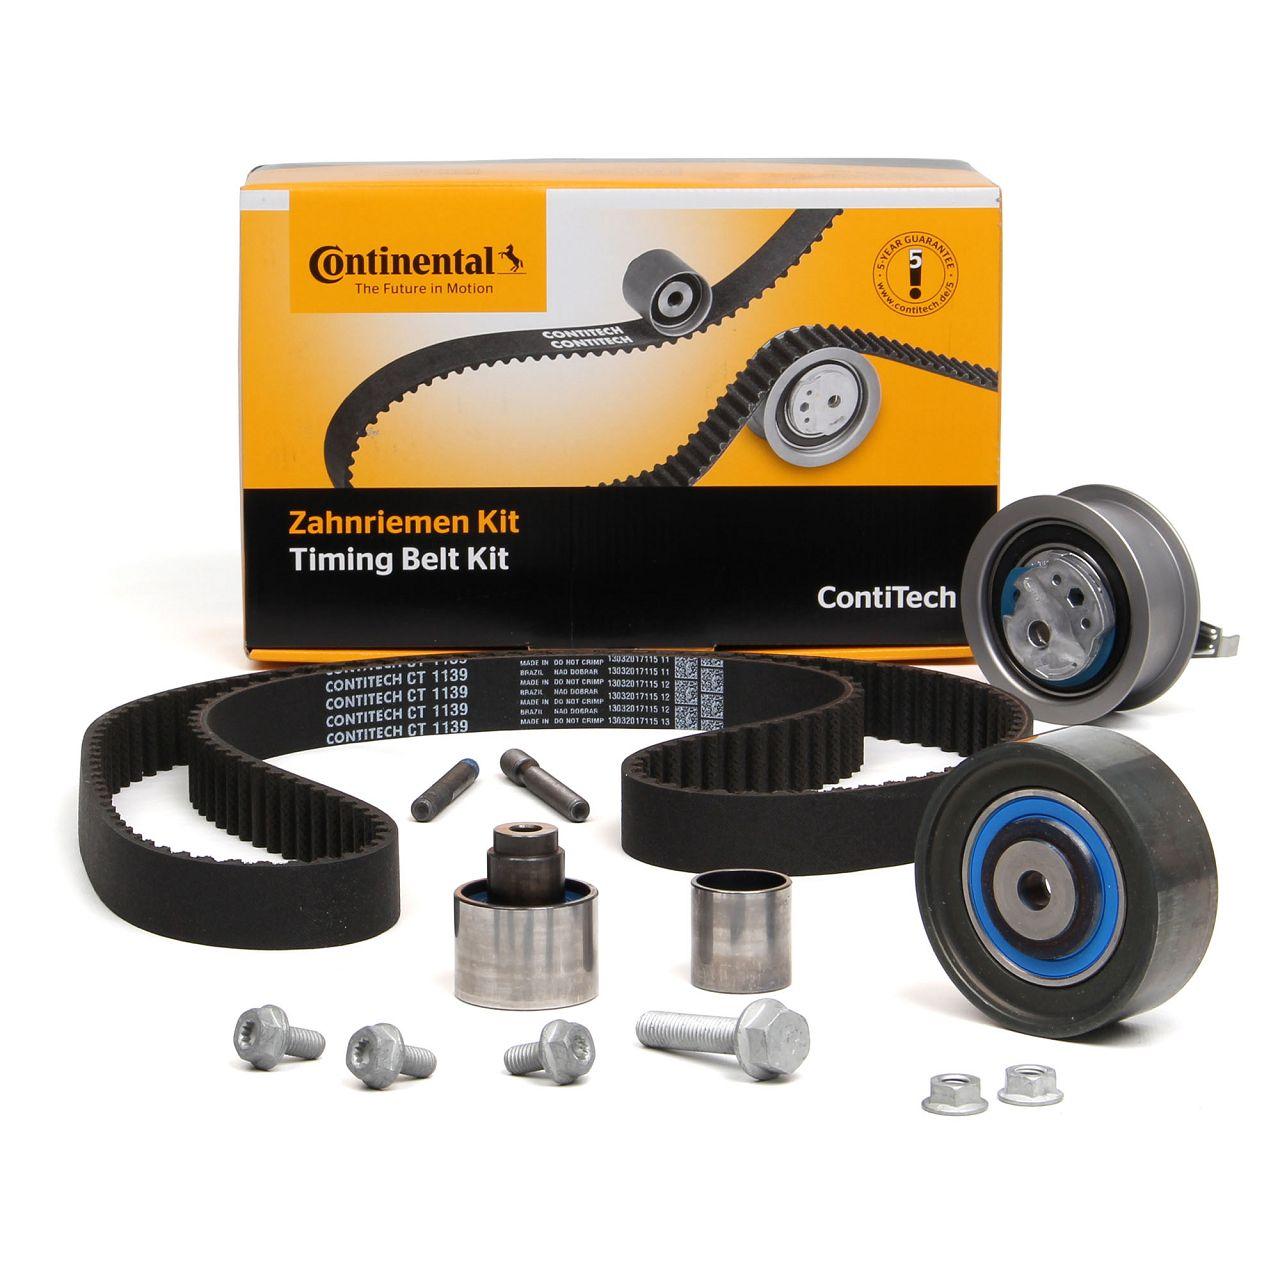 Conti CONTITECH Zahnriemensatz CT1139K2 für AUDI SEAT SKODA VW 1.6 TDI 2.0 TDI